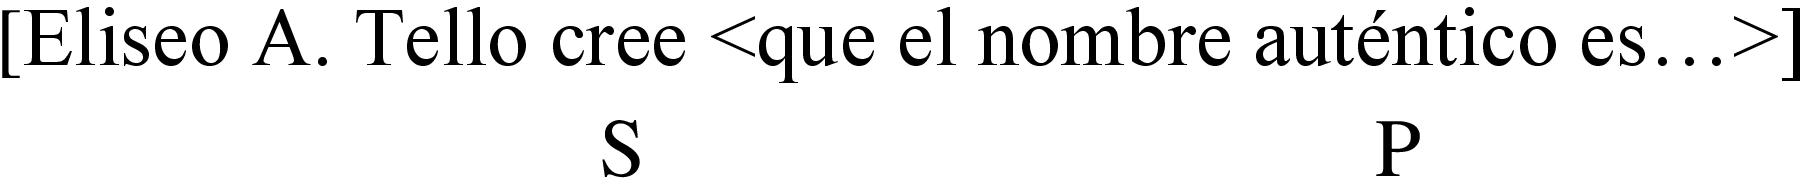 oracion-5-cap-5_c